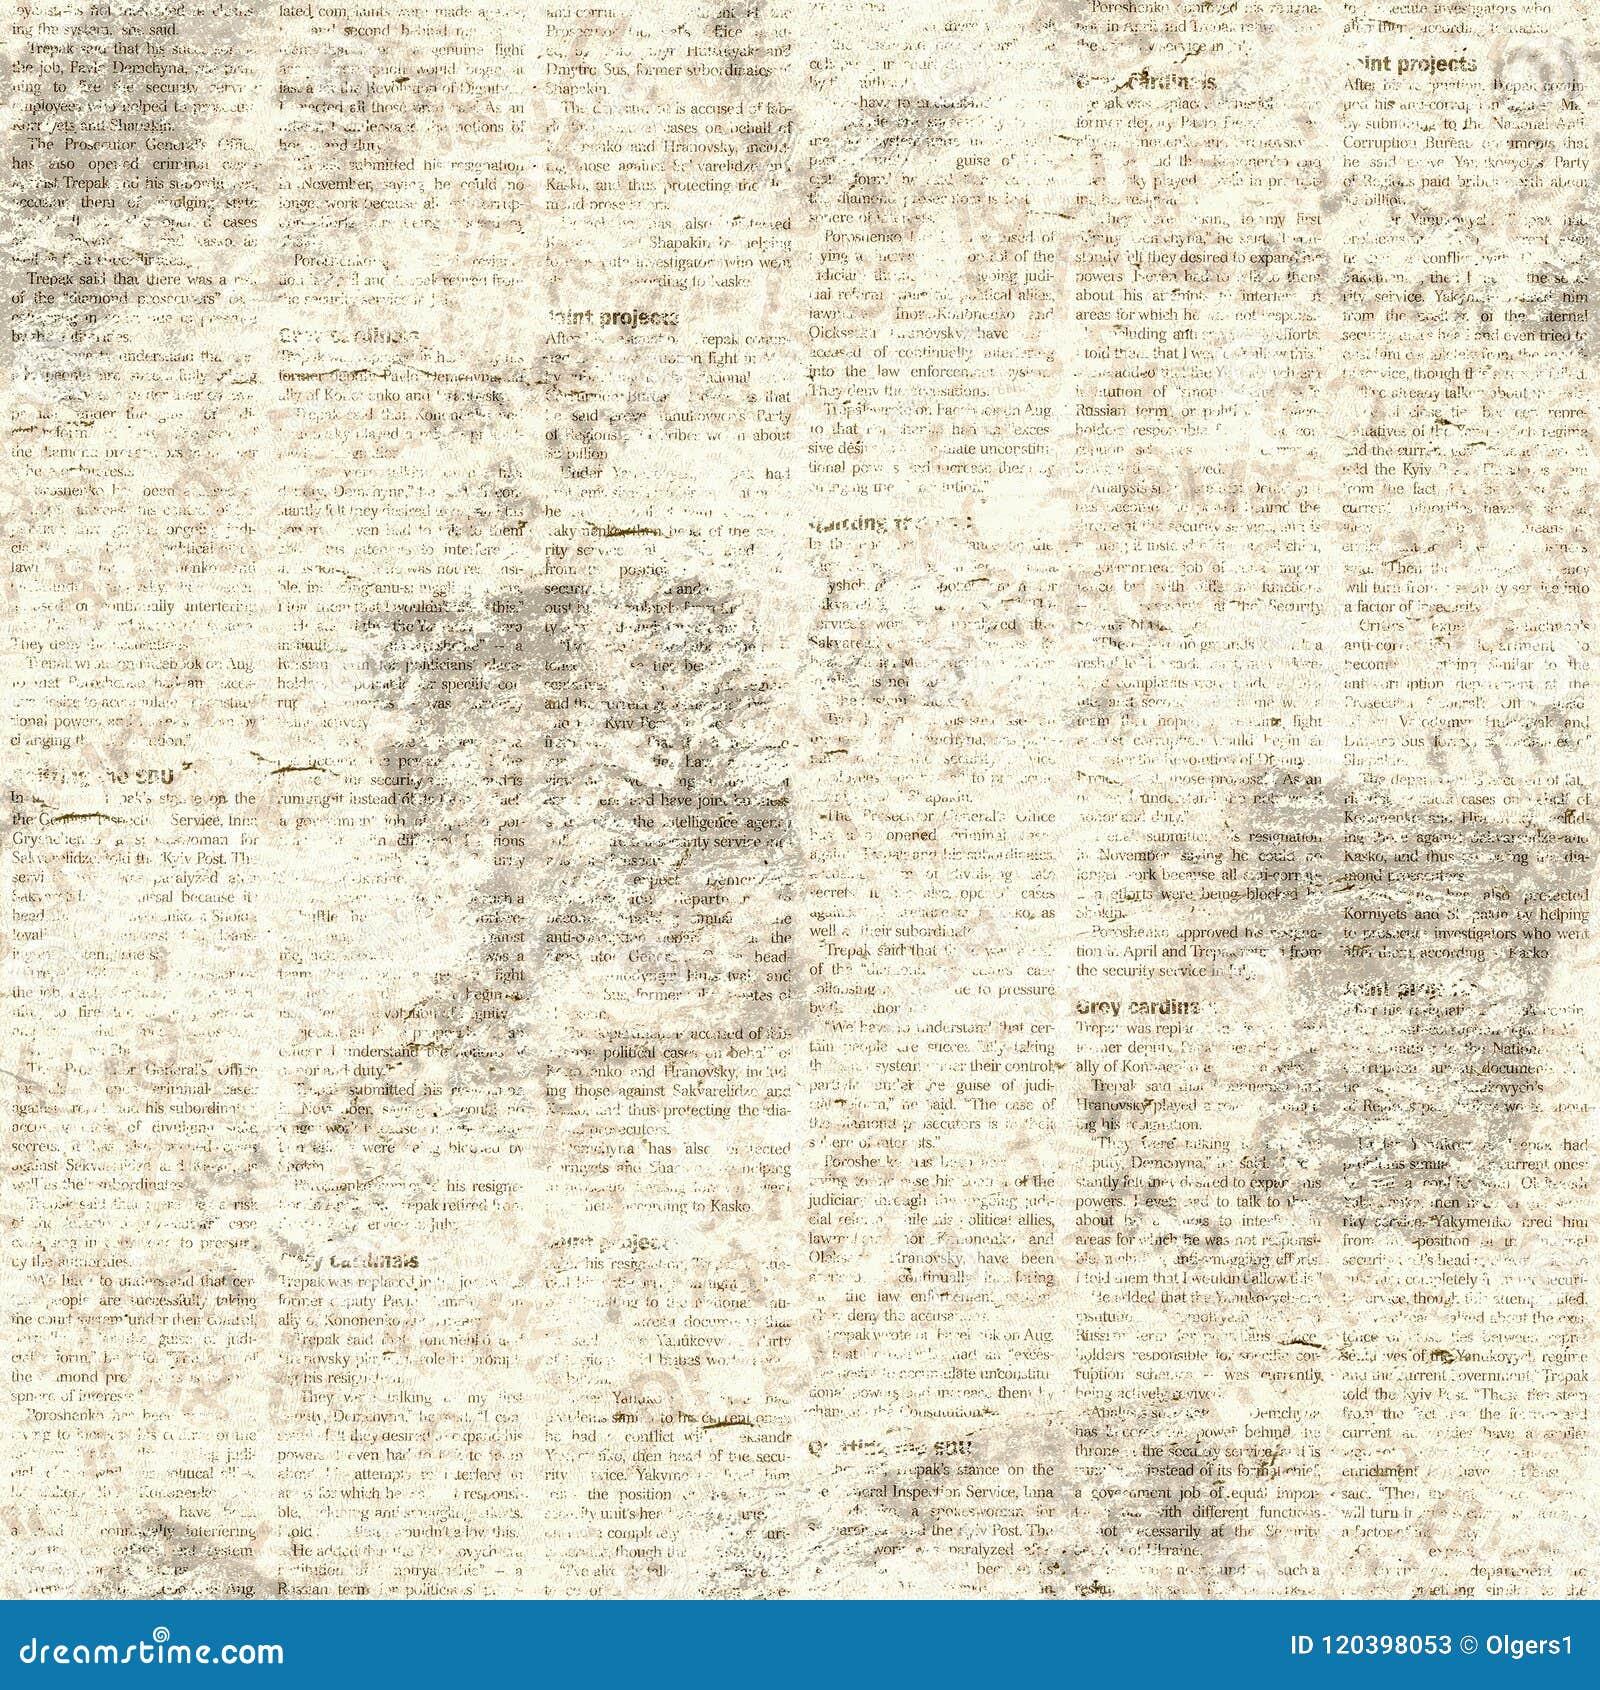 Newspaper Vintage Grunge Collage Seamless Texture Stock Image